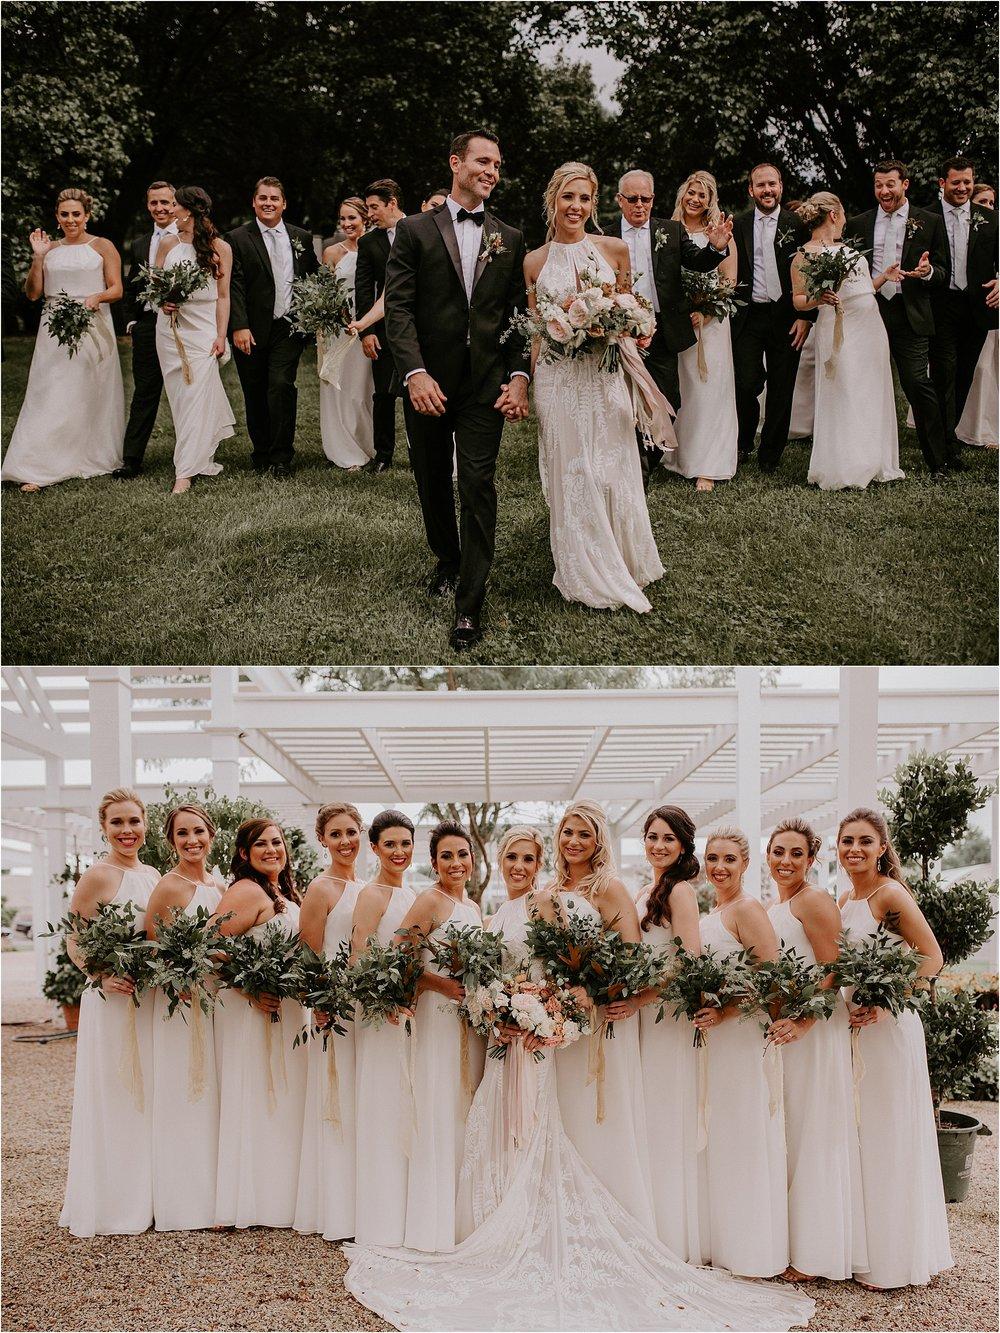 Sarah_Brookhart_Hortulus_Farm_Garden_and_Nursey_Wedding_Photographer_0040.jpg